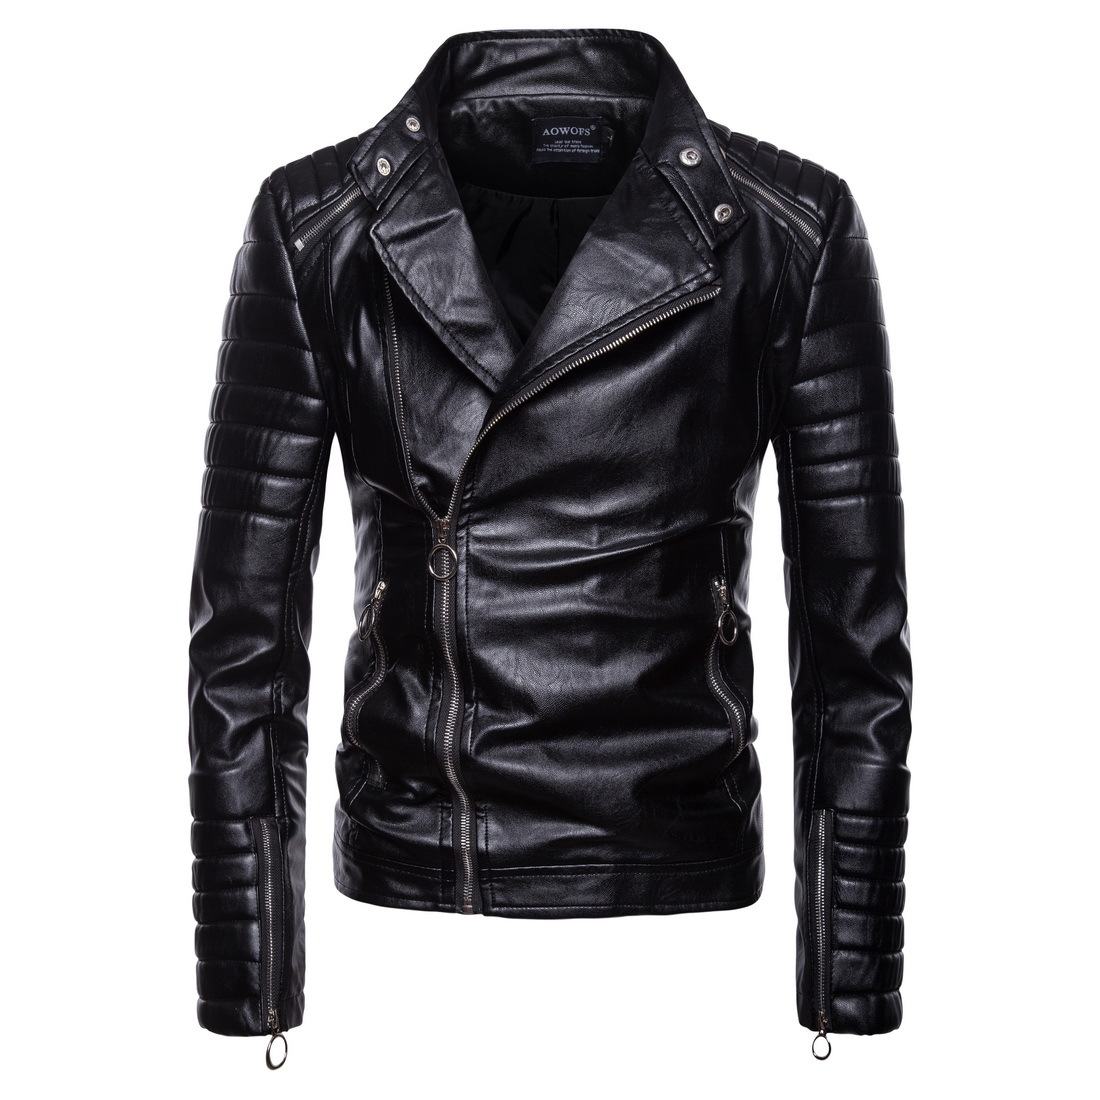 2018 Men's Classic Cross-pull Leather Jacket High Quality Men's Motorcycle Leather Jacket Jaqueta De Couro Coat Men Fashion